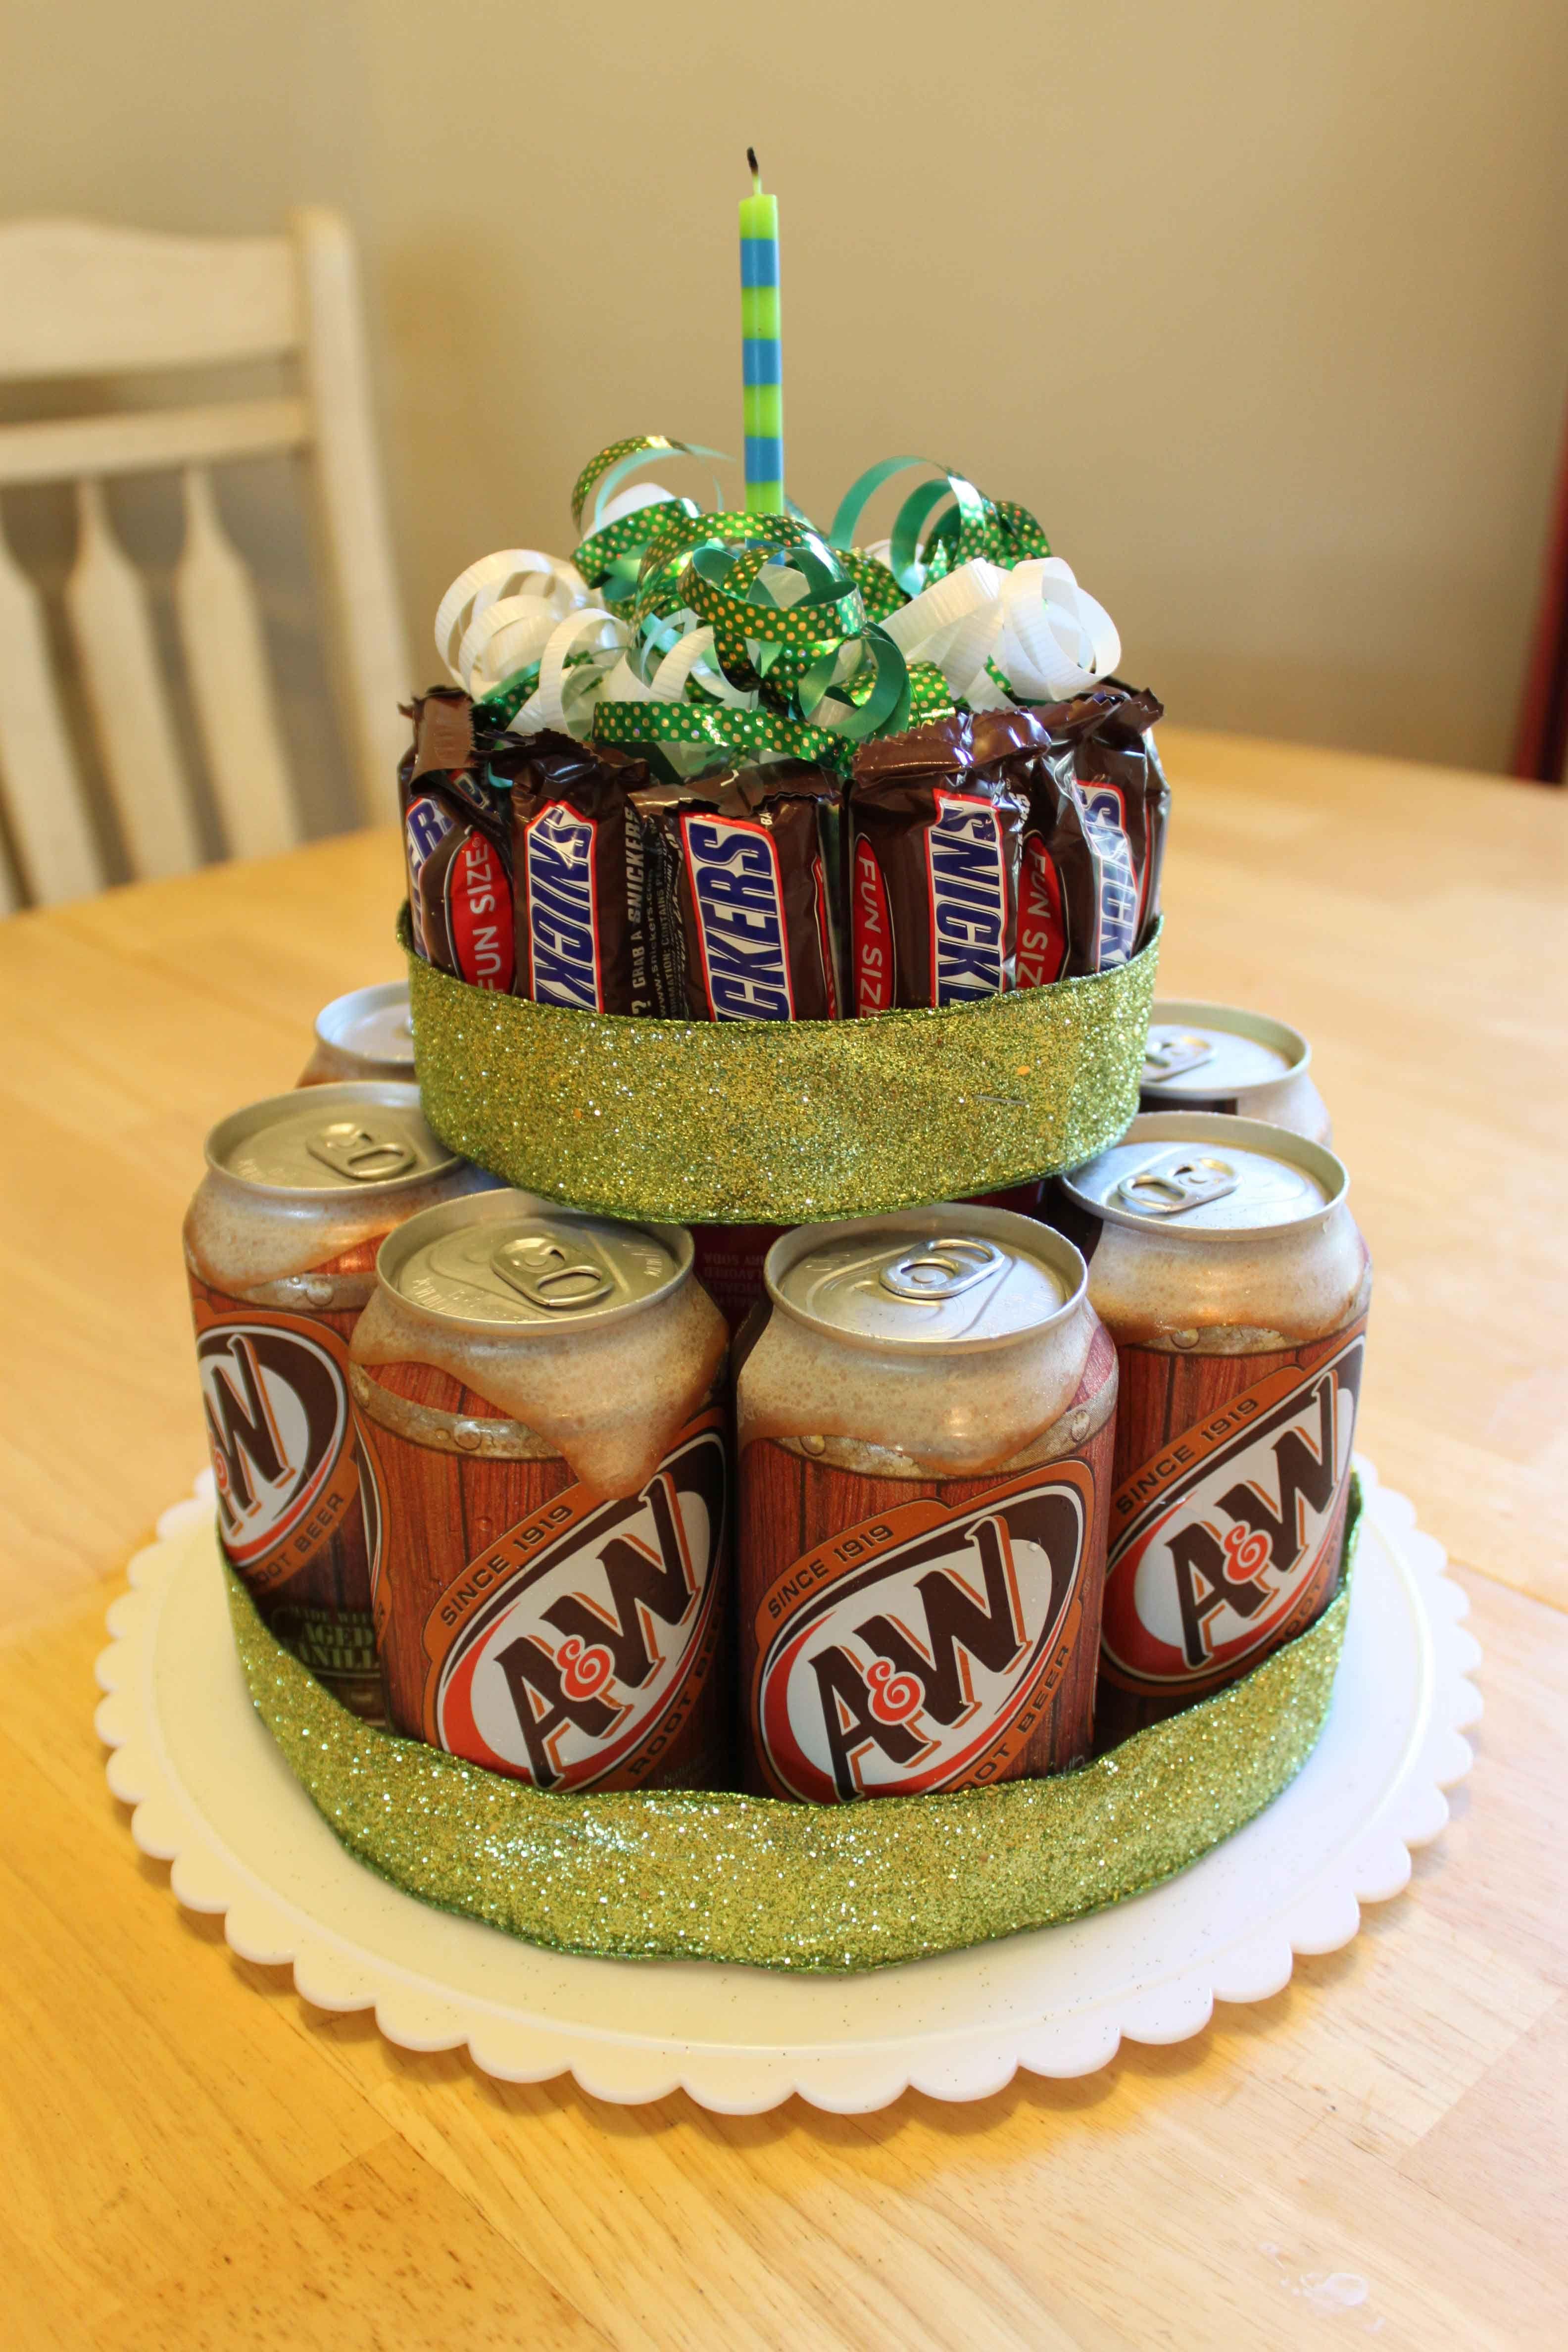 Fun Birthday Cake Gift Birthcake Diy Gift Party Gift